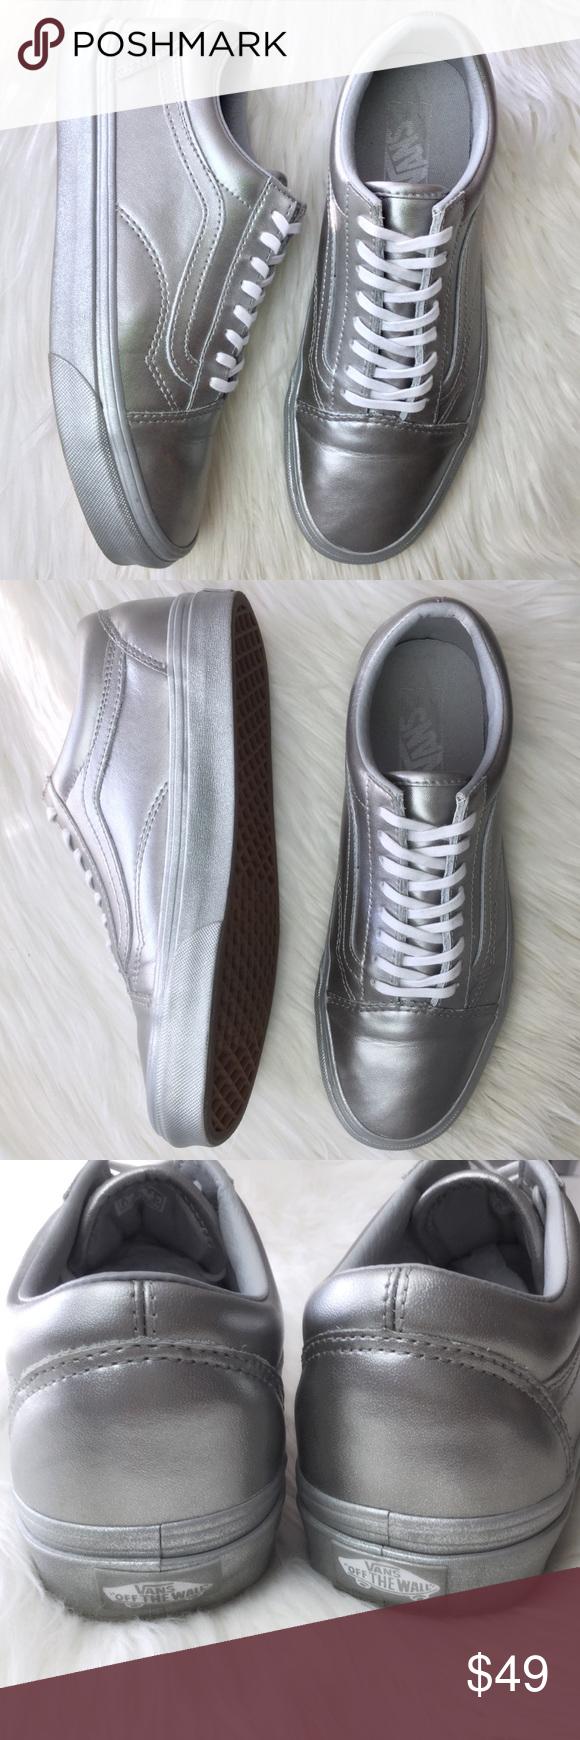 249186b62e Vans Metallic Sidewall Old Skool skate shoes Vans The Metallic Sidewall Old  Skool skate shoes Vans classic flatform skate shoe- the first to bare the  iconic ...